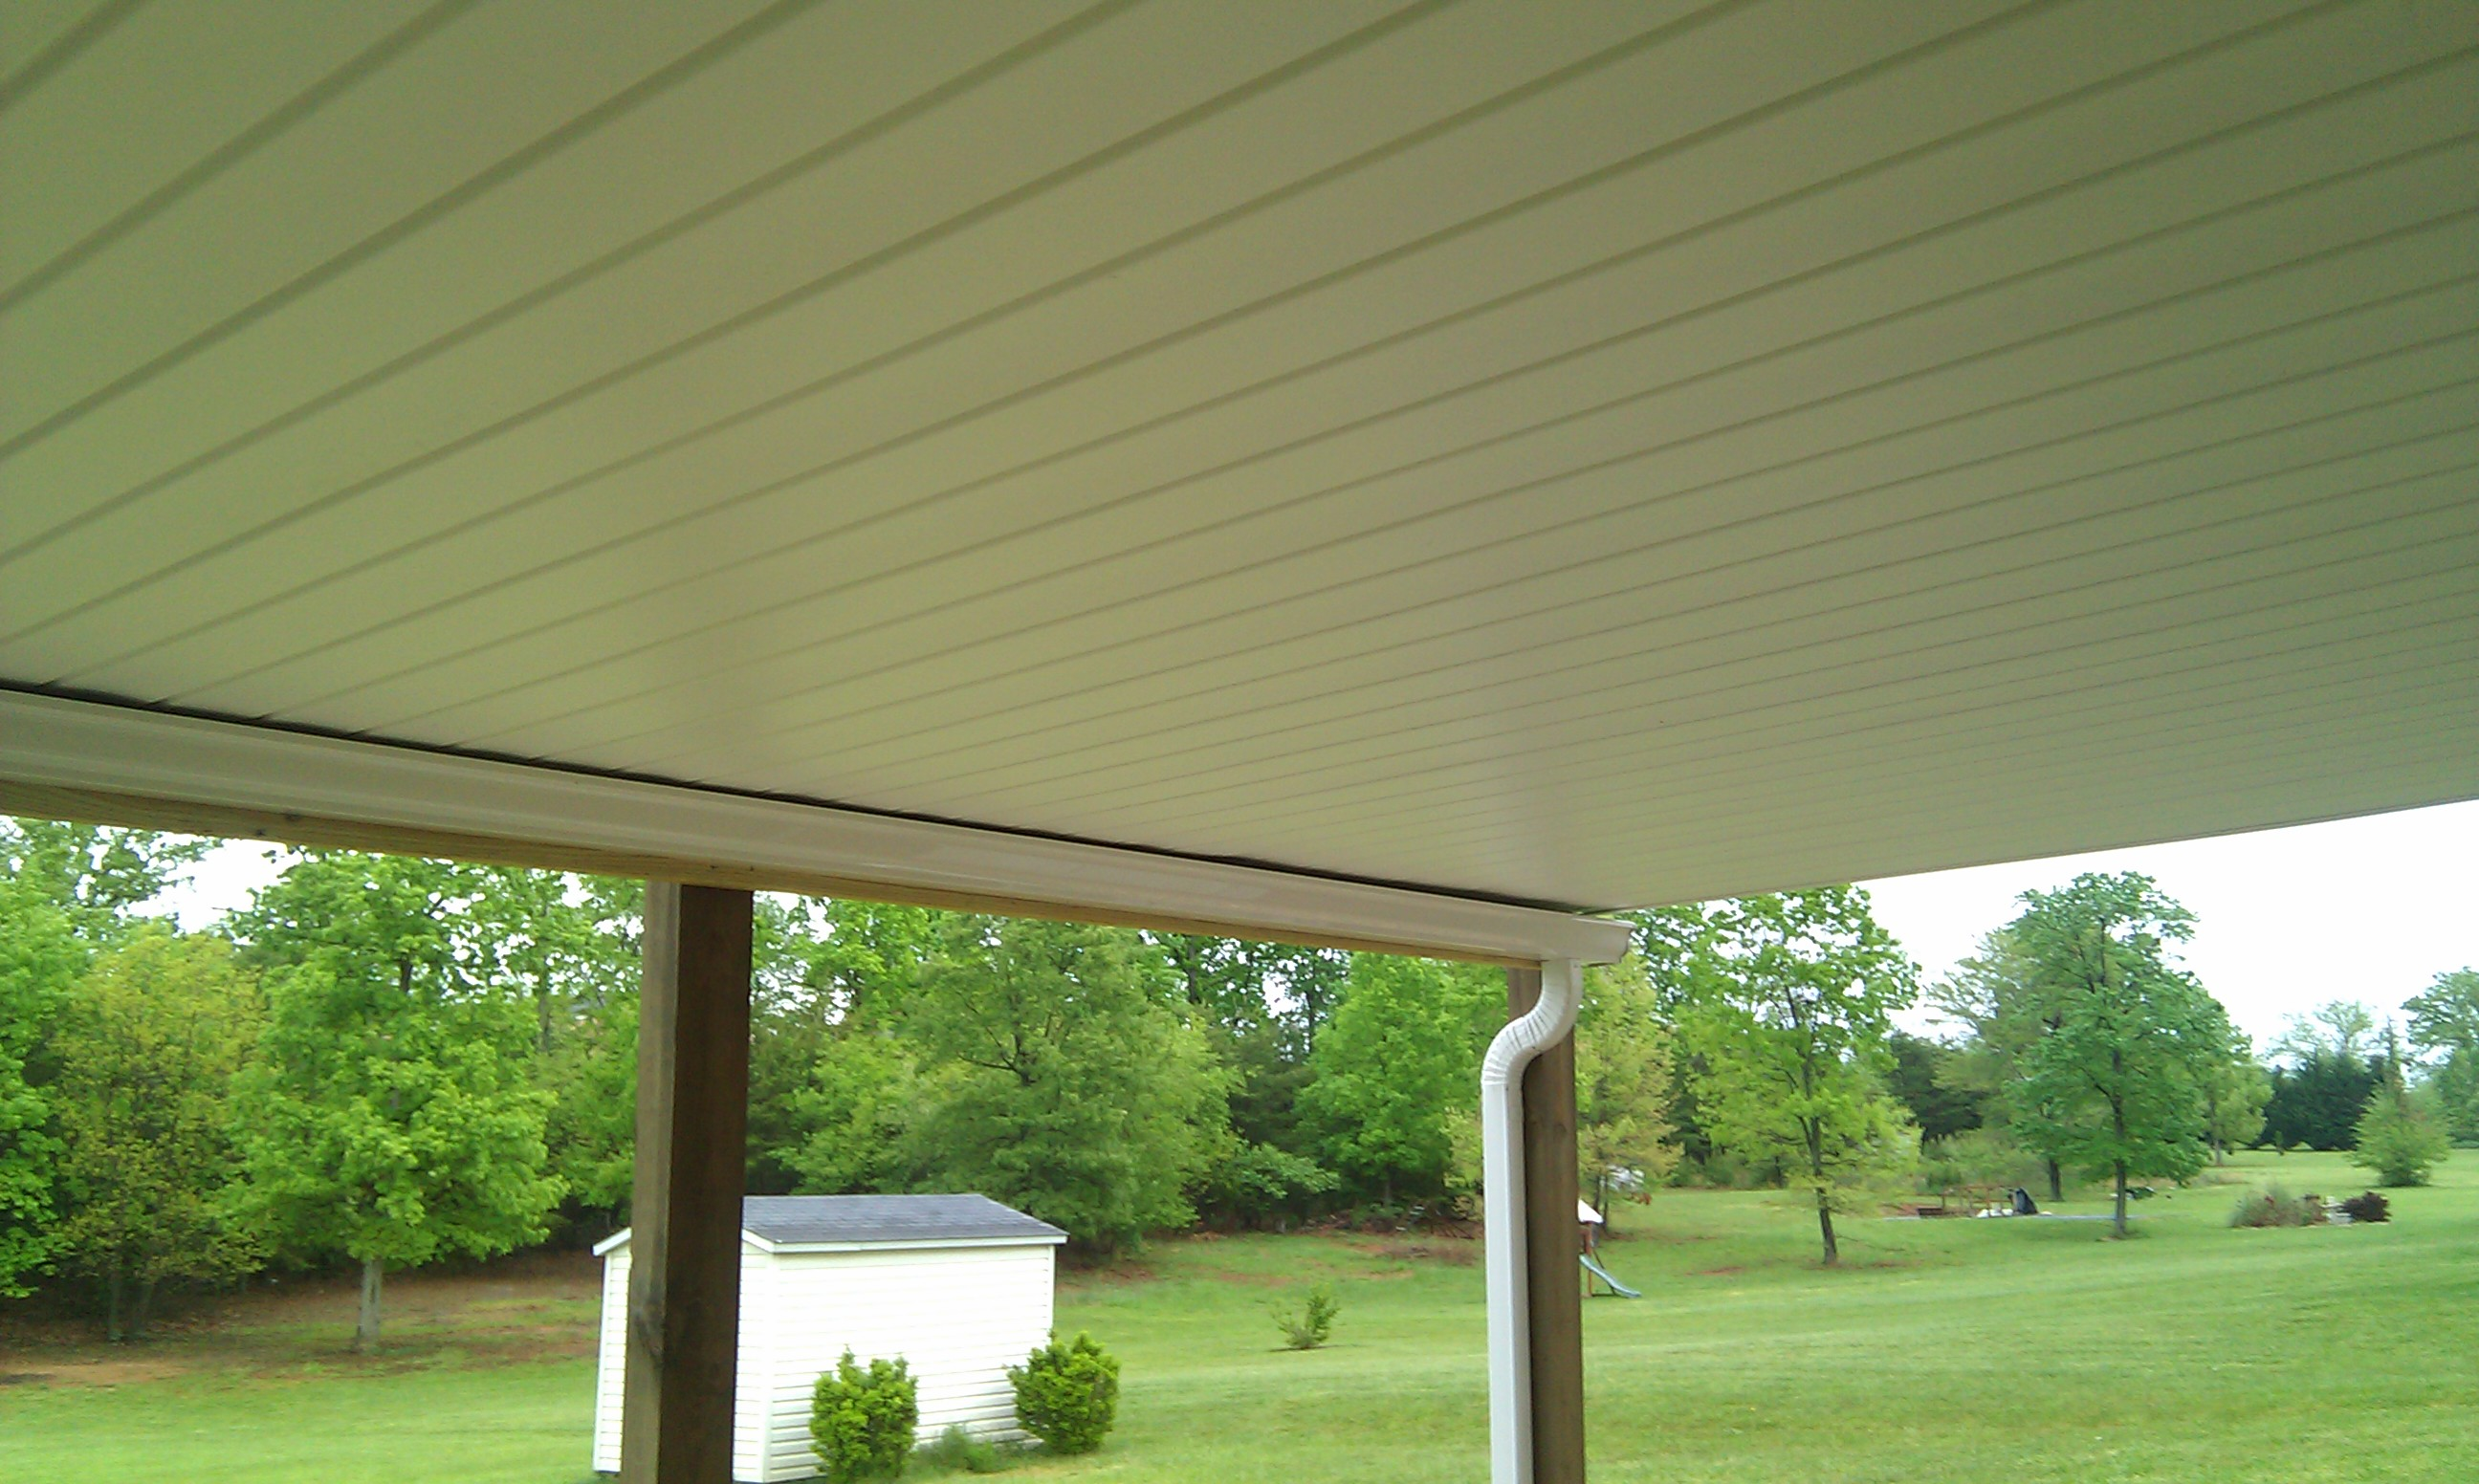 Best Under Deck Drainage System 187 Design And Ideas